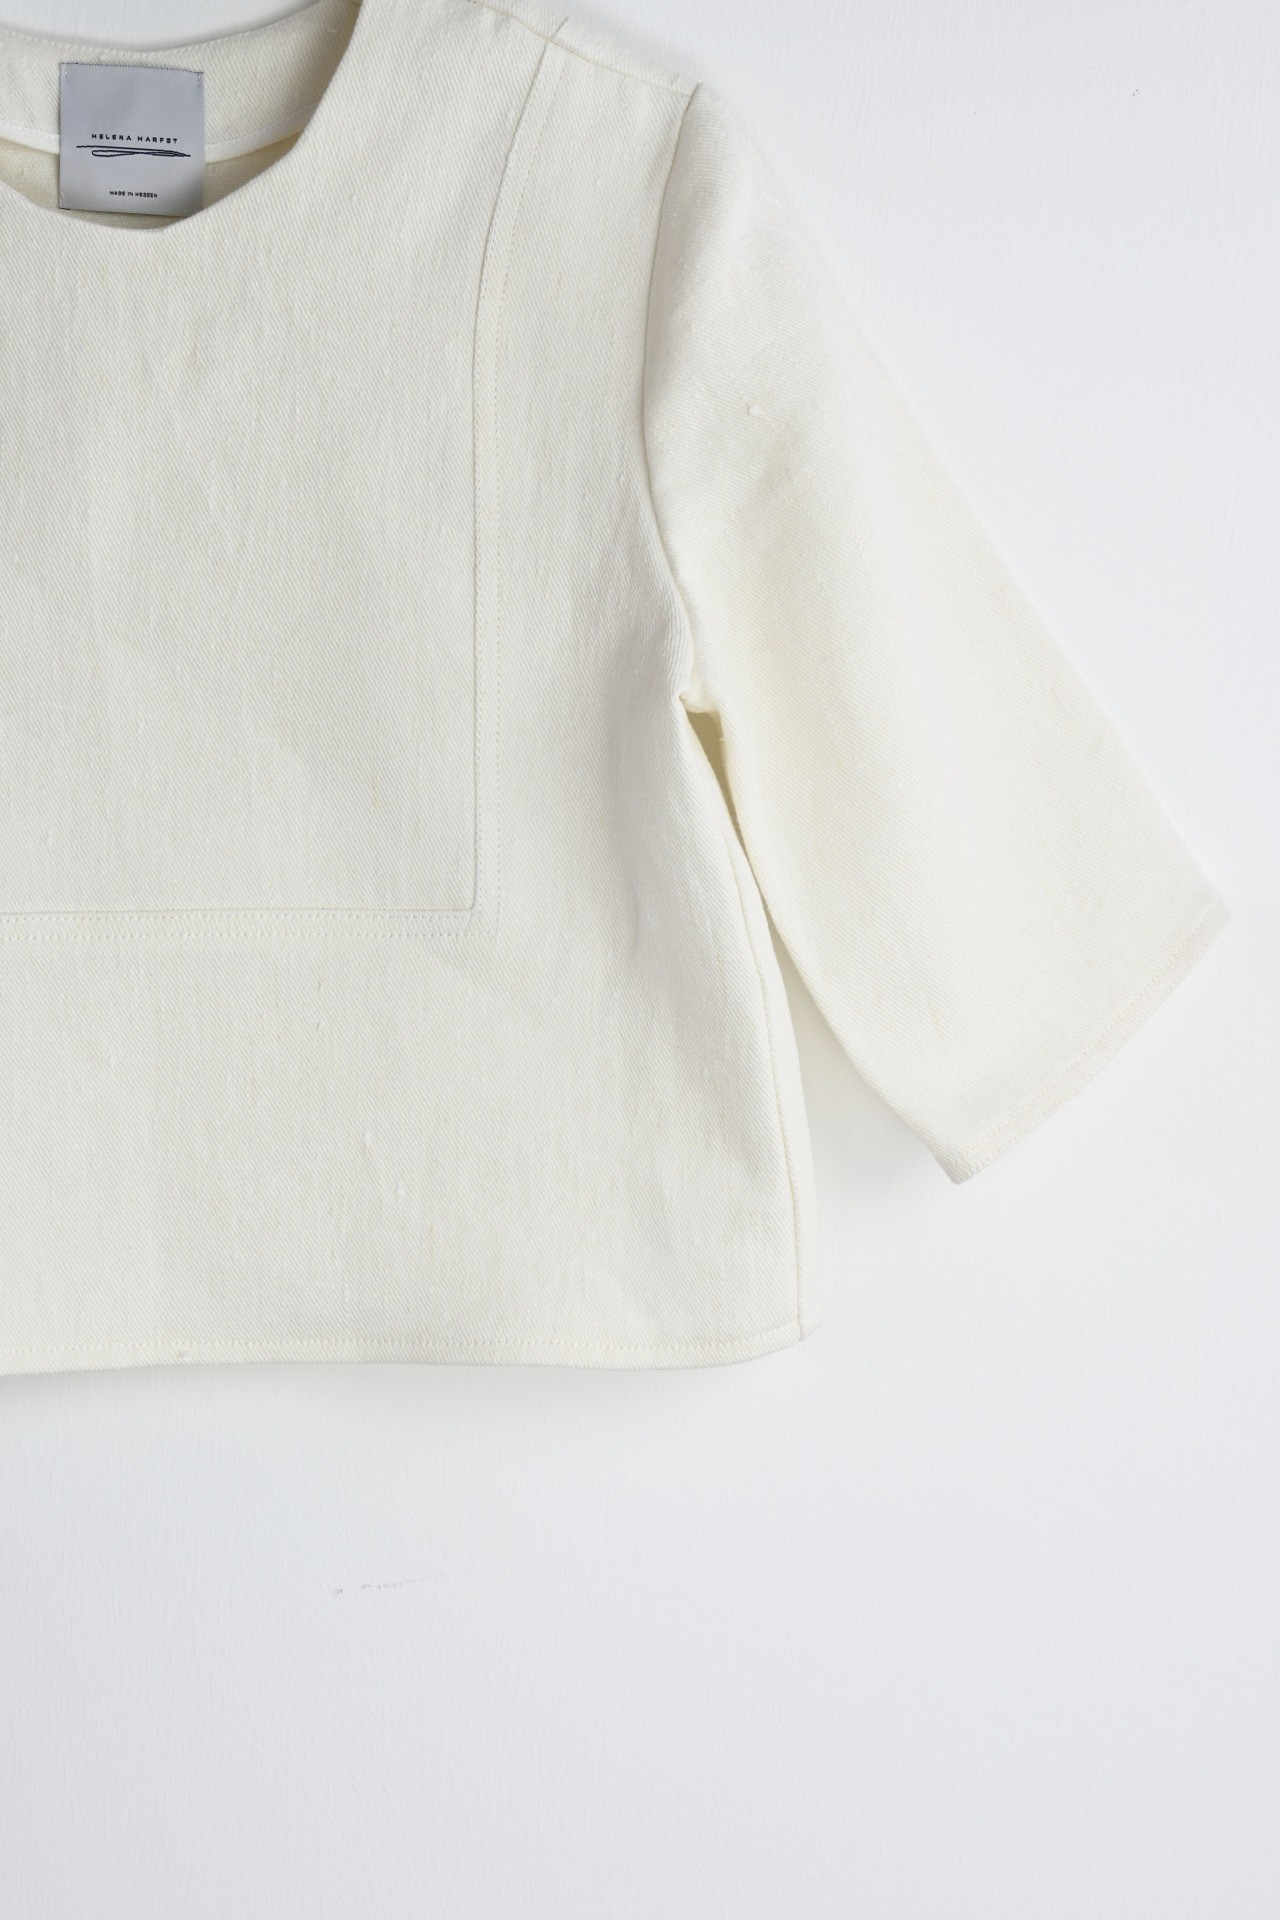 Gartenshirt creme - Detailansicht